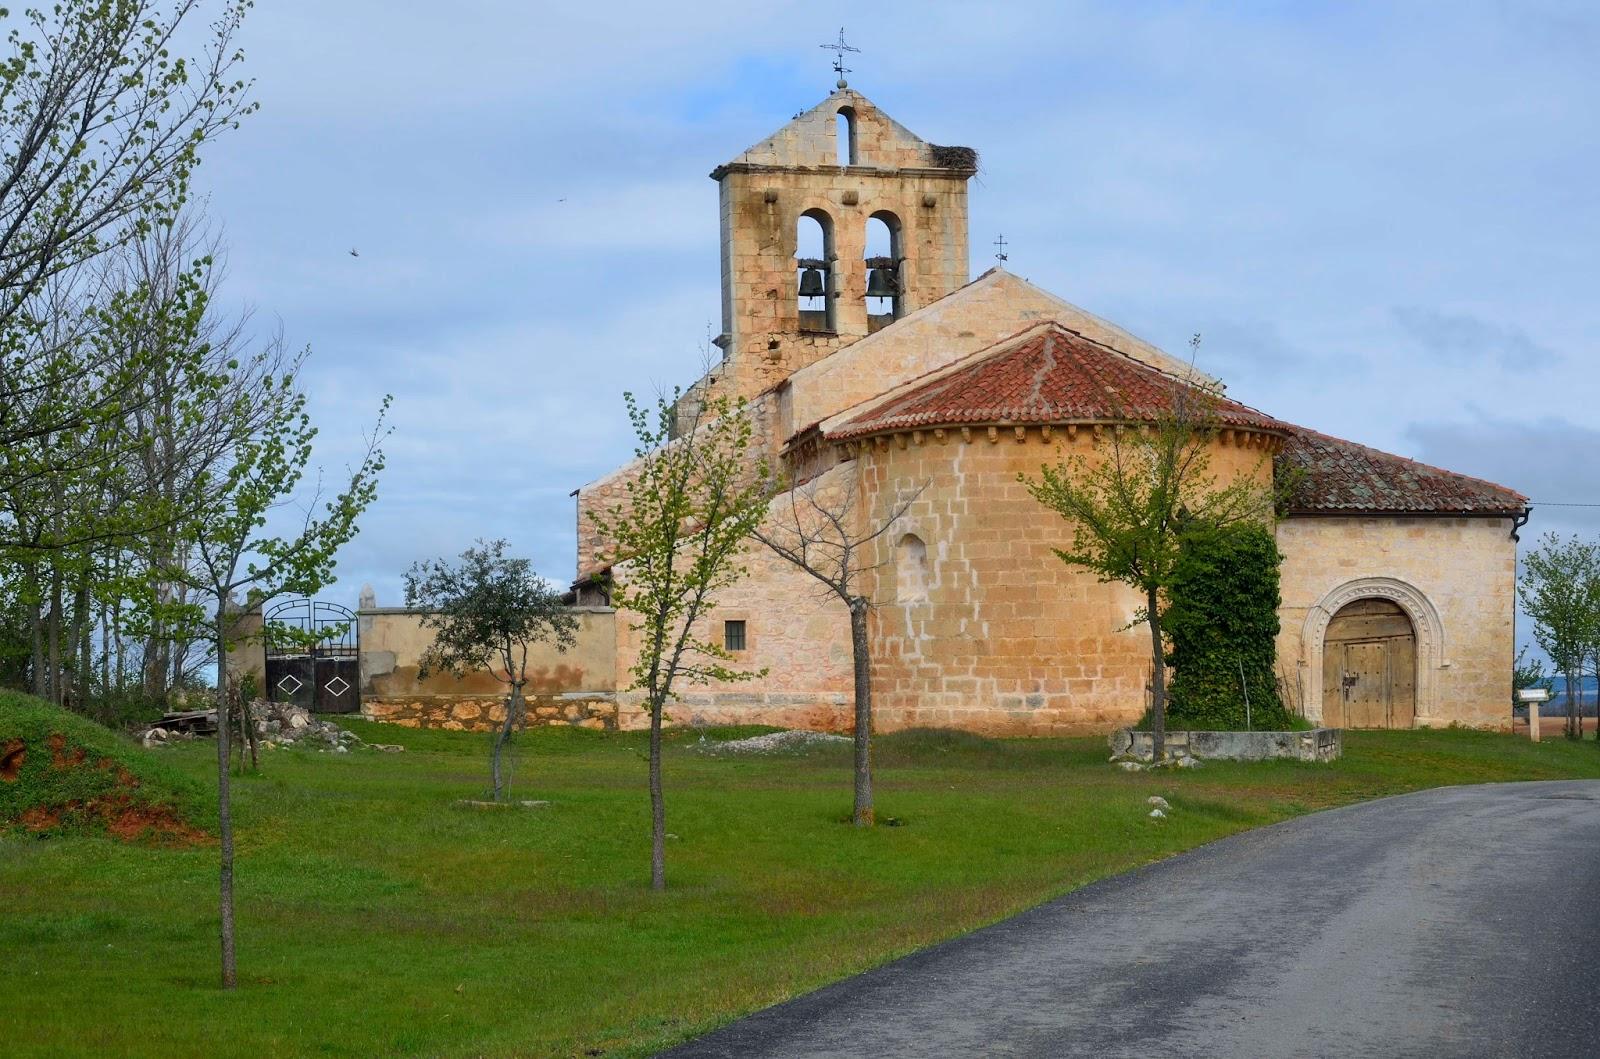 Resultado de imagen de Barahona del Fresno. Iglesia de San Cristóbal